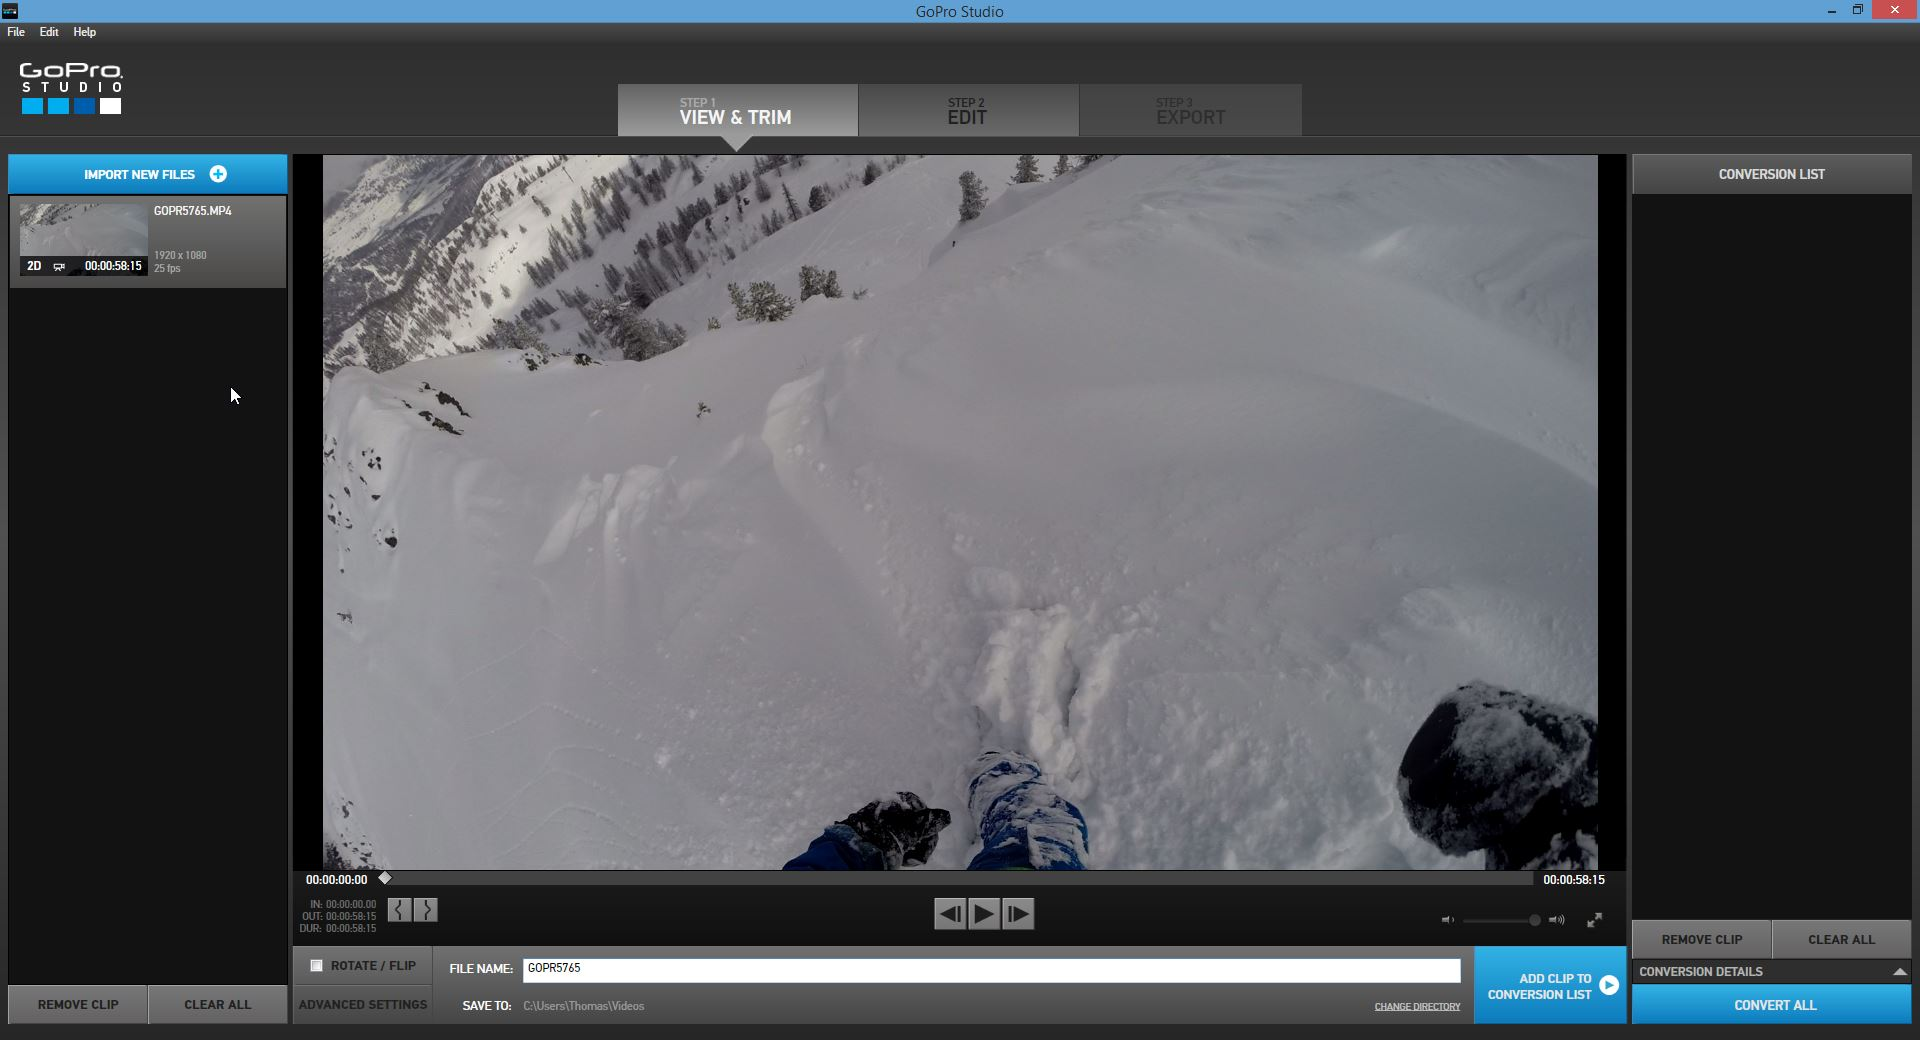 Test du logiciel de montage GoPro Studio 2.0 - studioSPORT